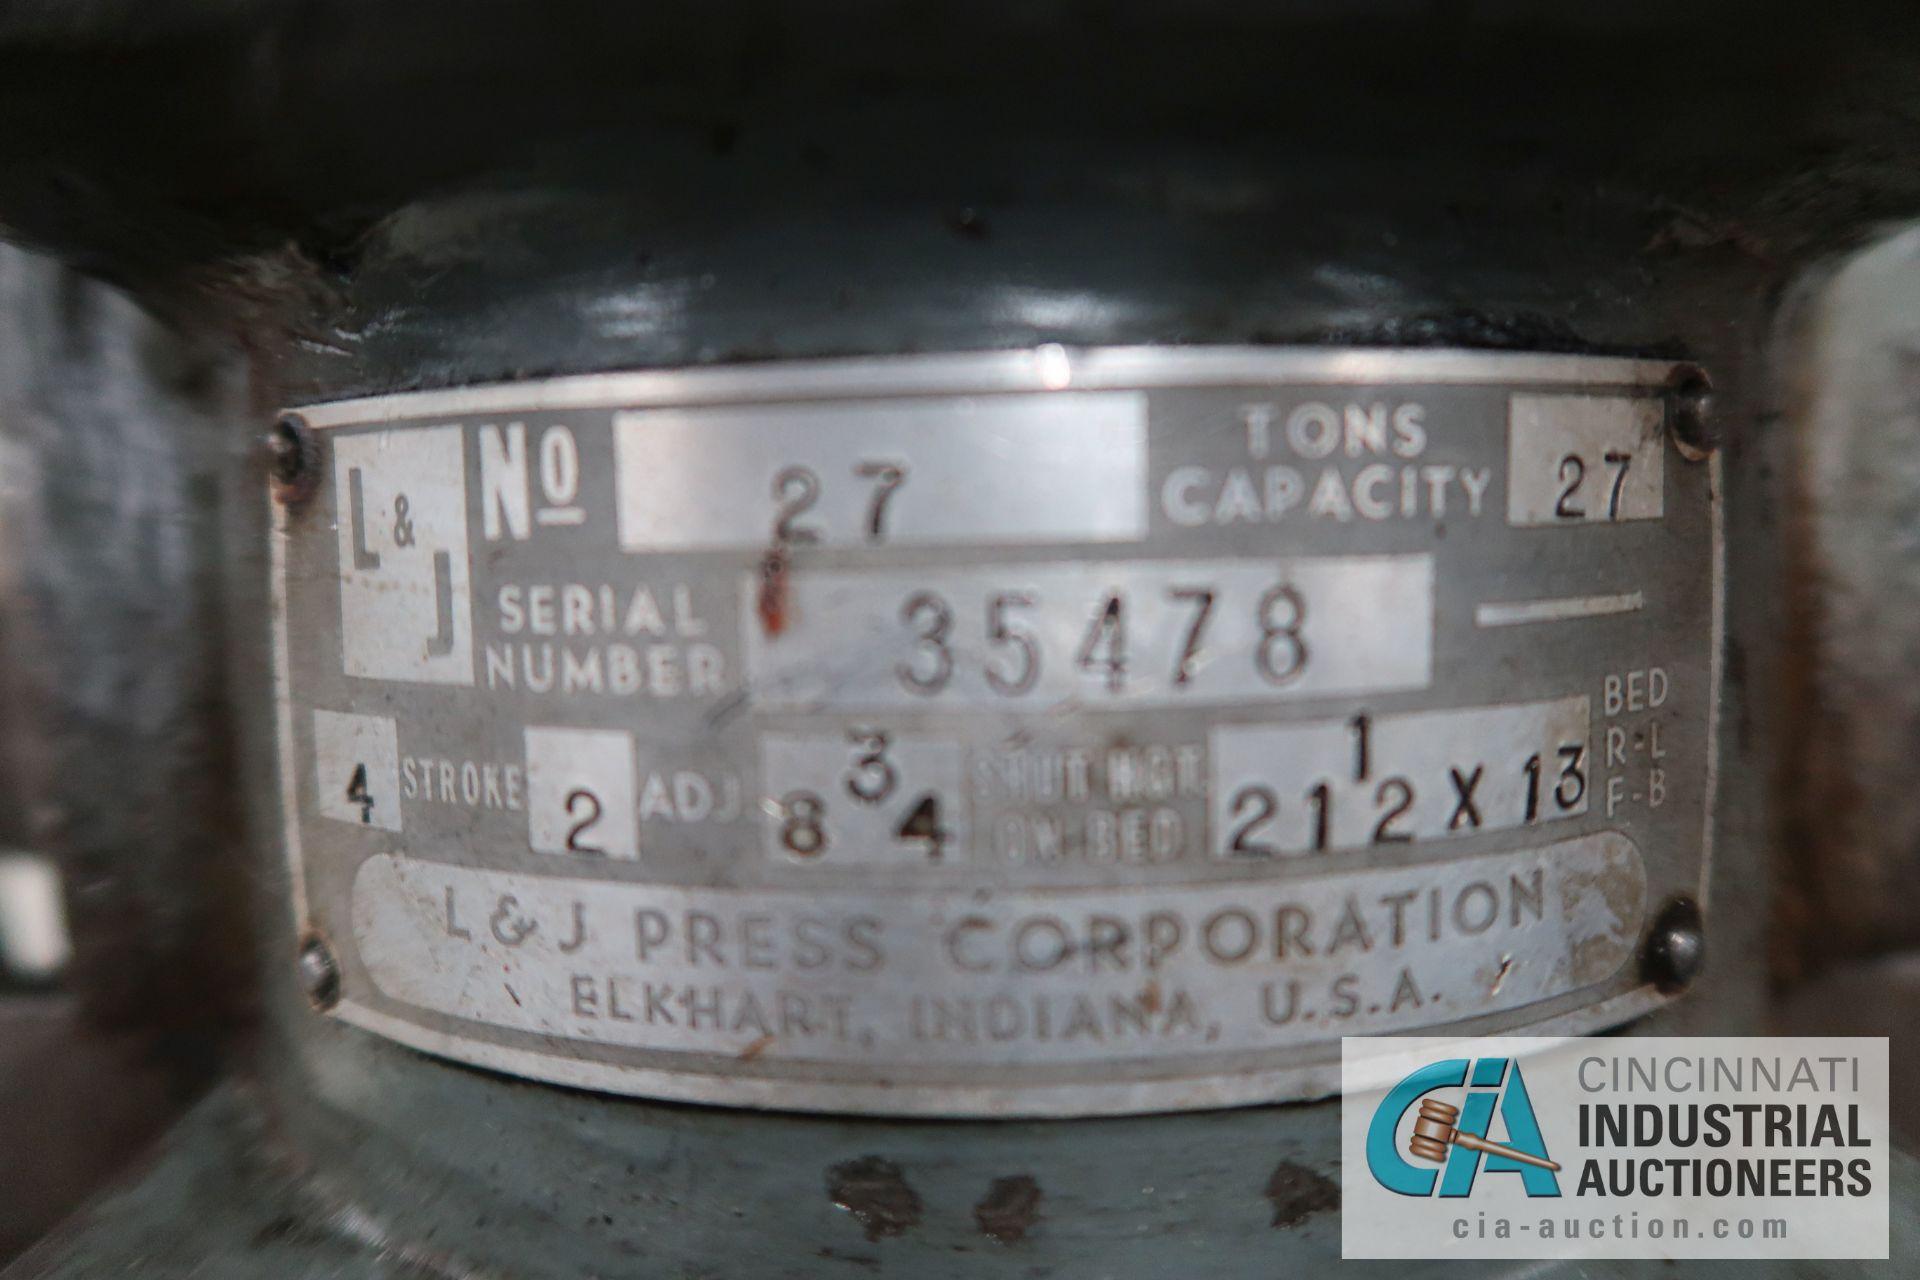 "27 TON L&J NO. 27 BACK GEARED OBI PRESS; S/N 35478, 4"" STROKE, 2"" ADJUST, 8-3/4"" SHUT HEIGHT ON BED, - Image 9 of 9"